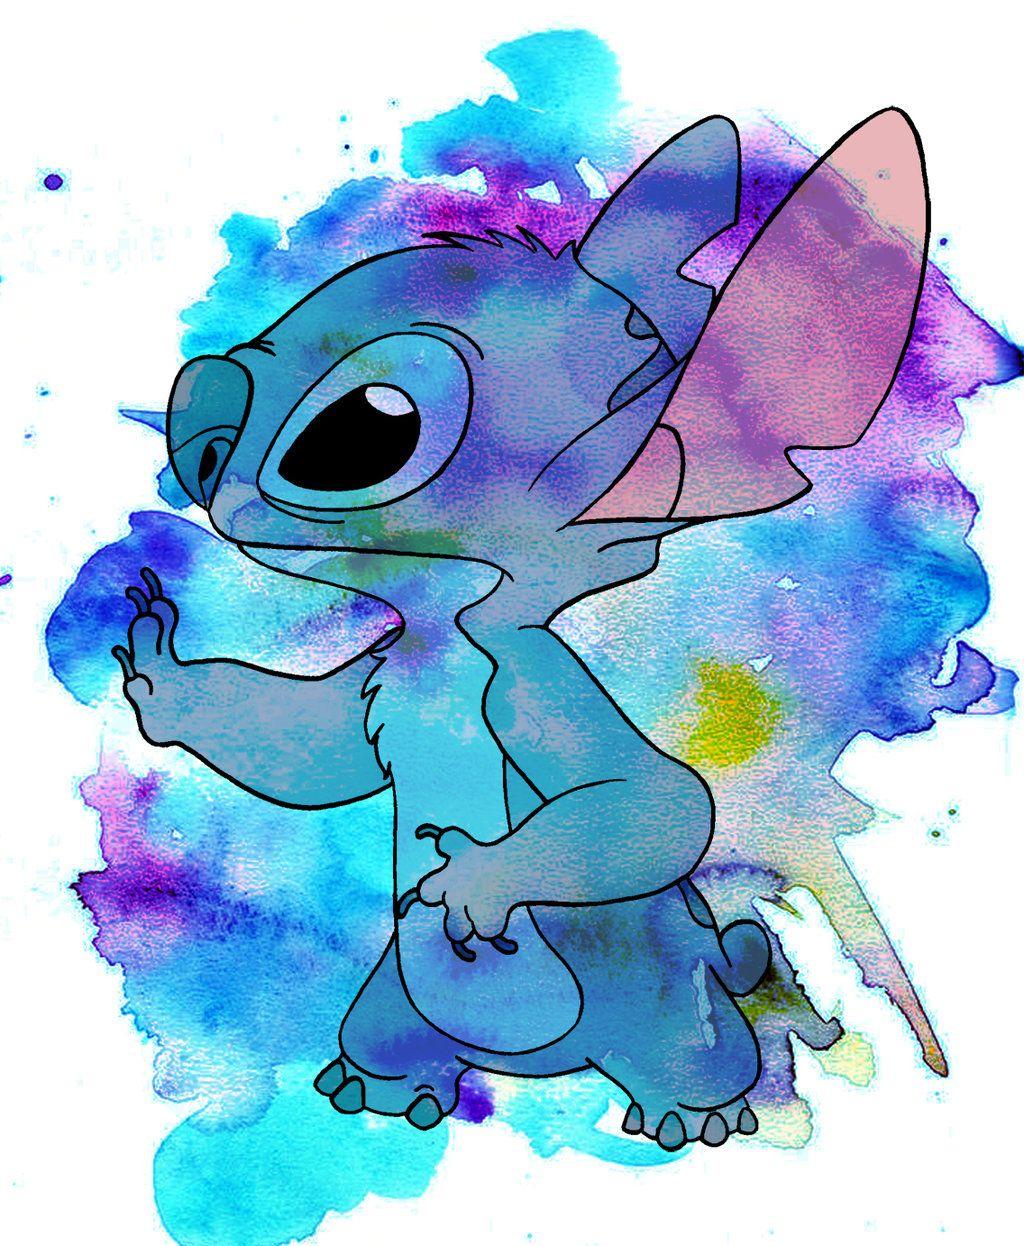 Stitch Watercolor By Jmascia Deviantart Com On Deviantart 壁紙